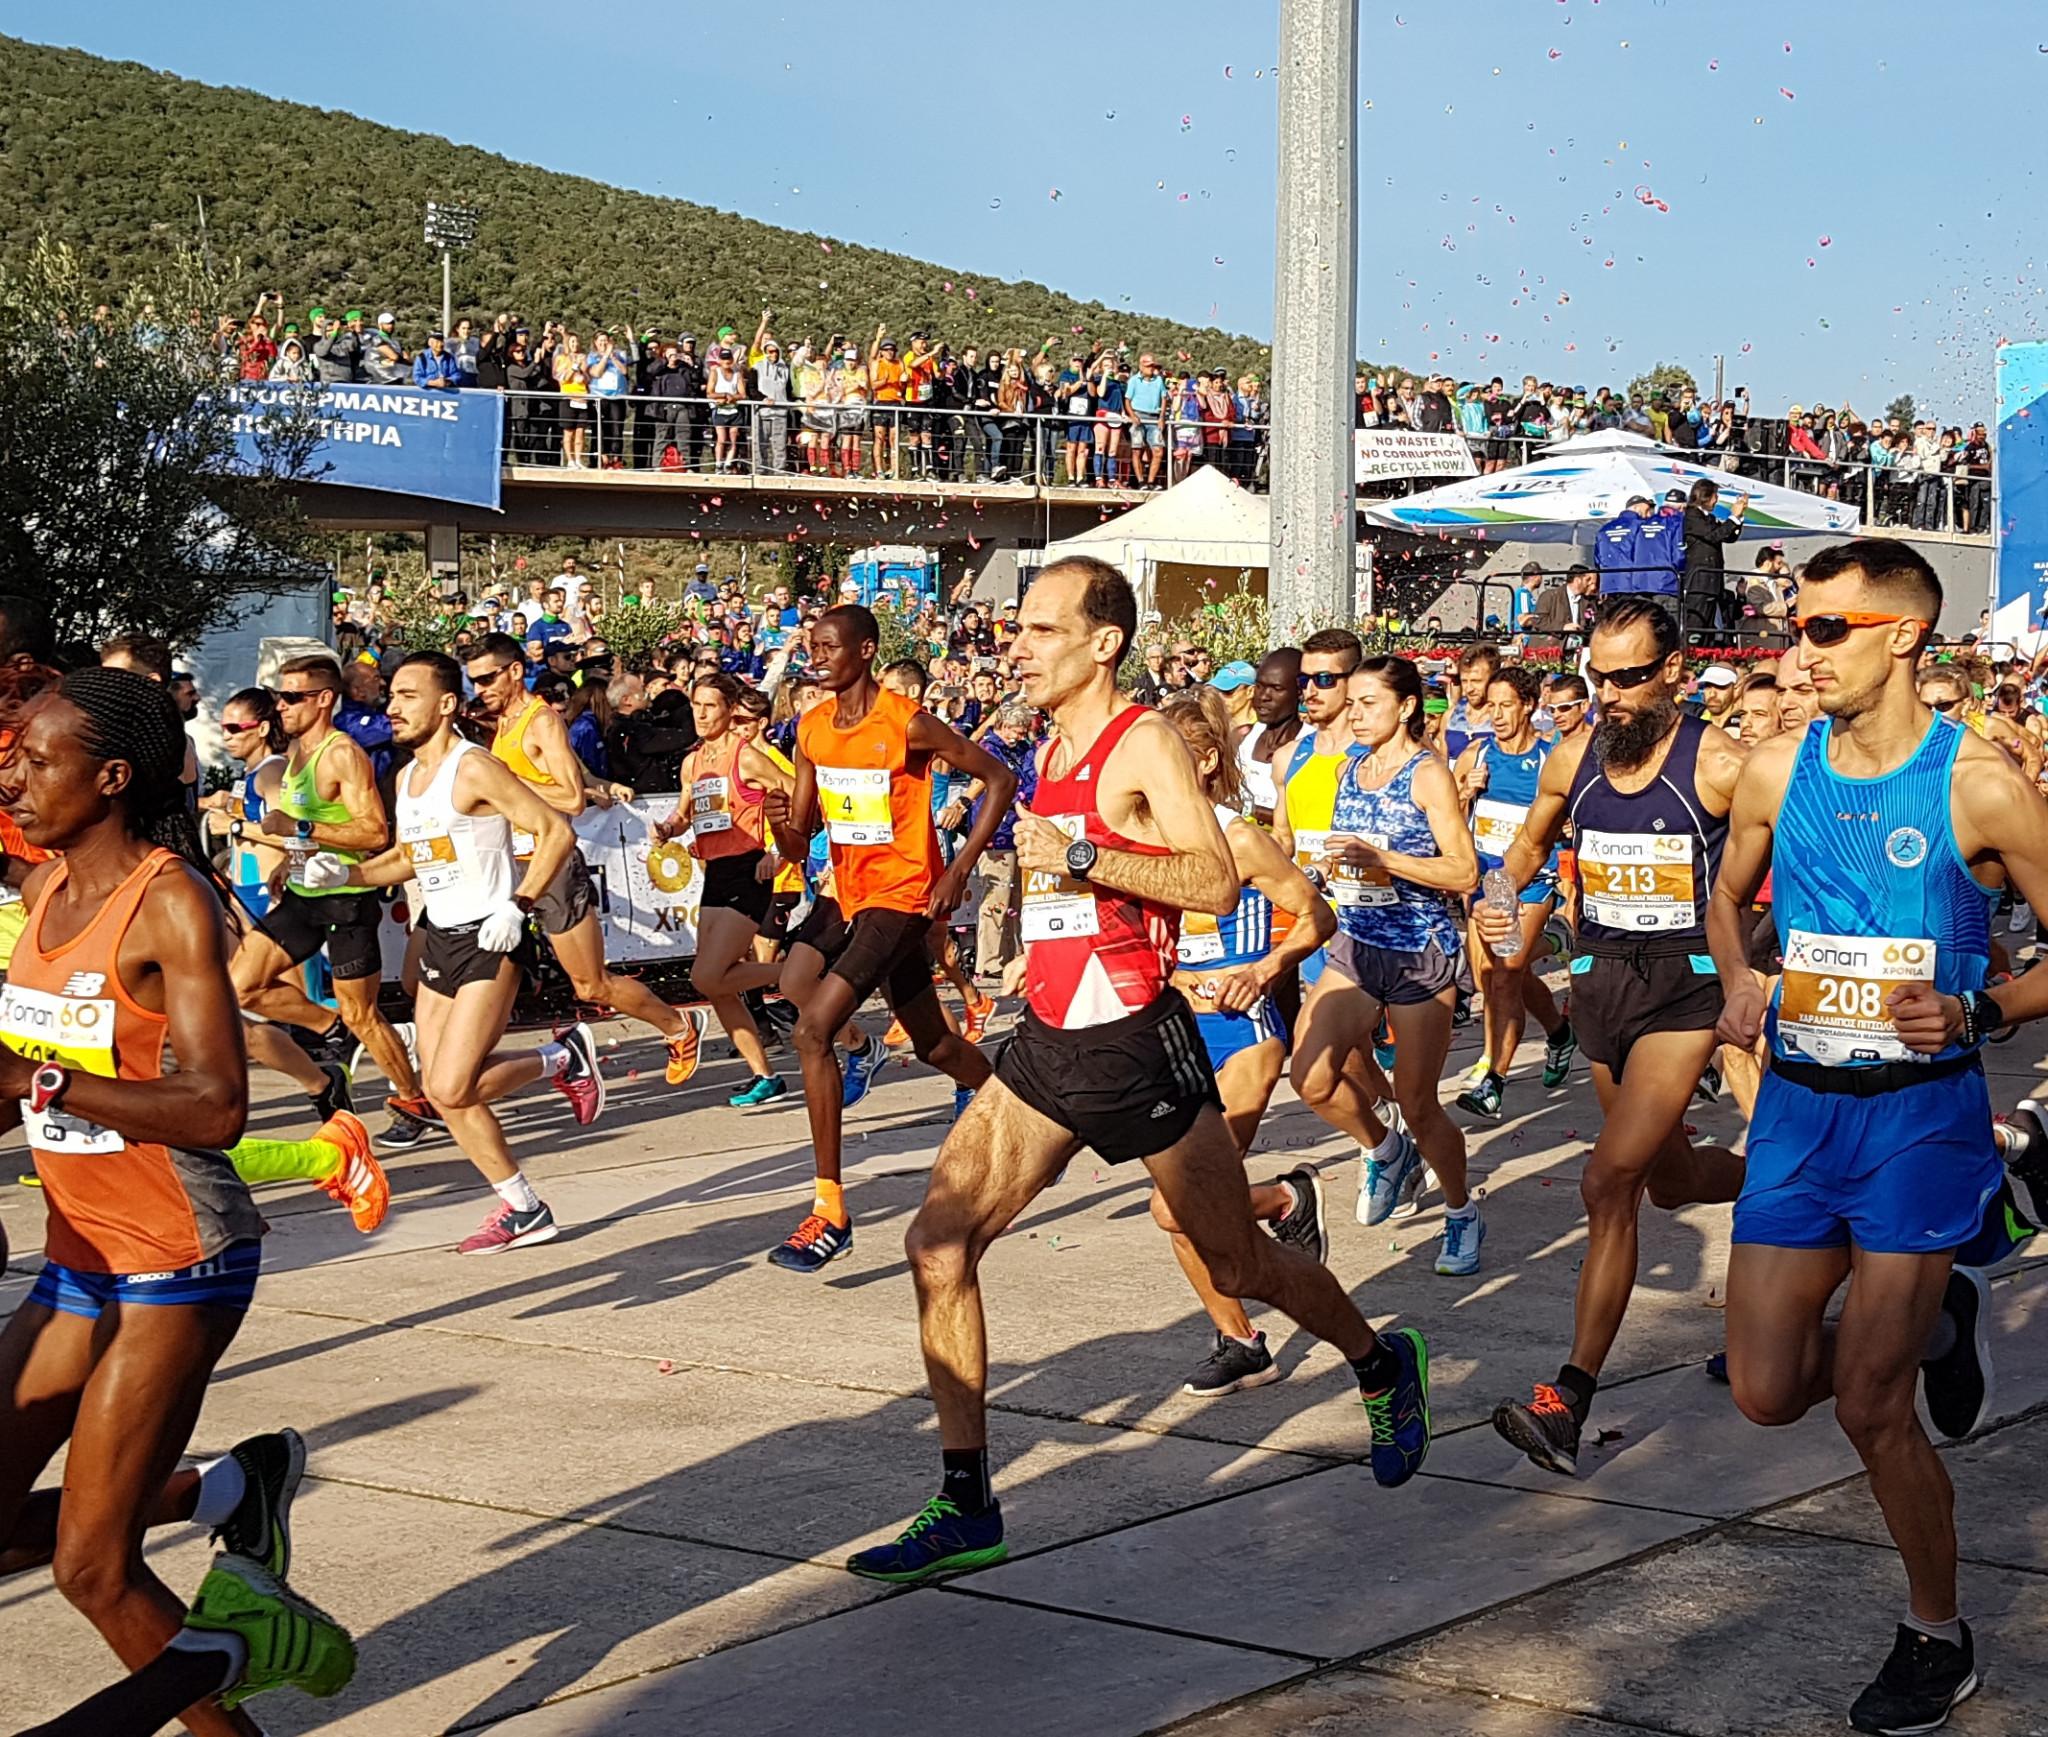 This year's Athens Marathon is set to go ahead in November as scheduled, despite the coronavirus crisis ©David Owen